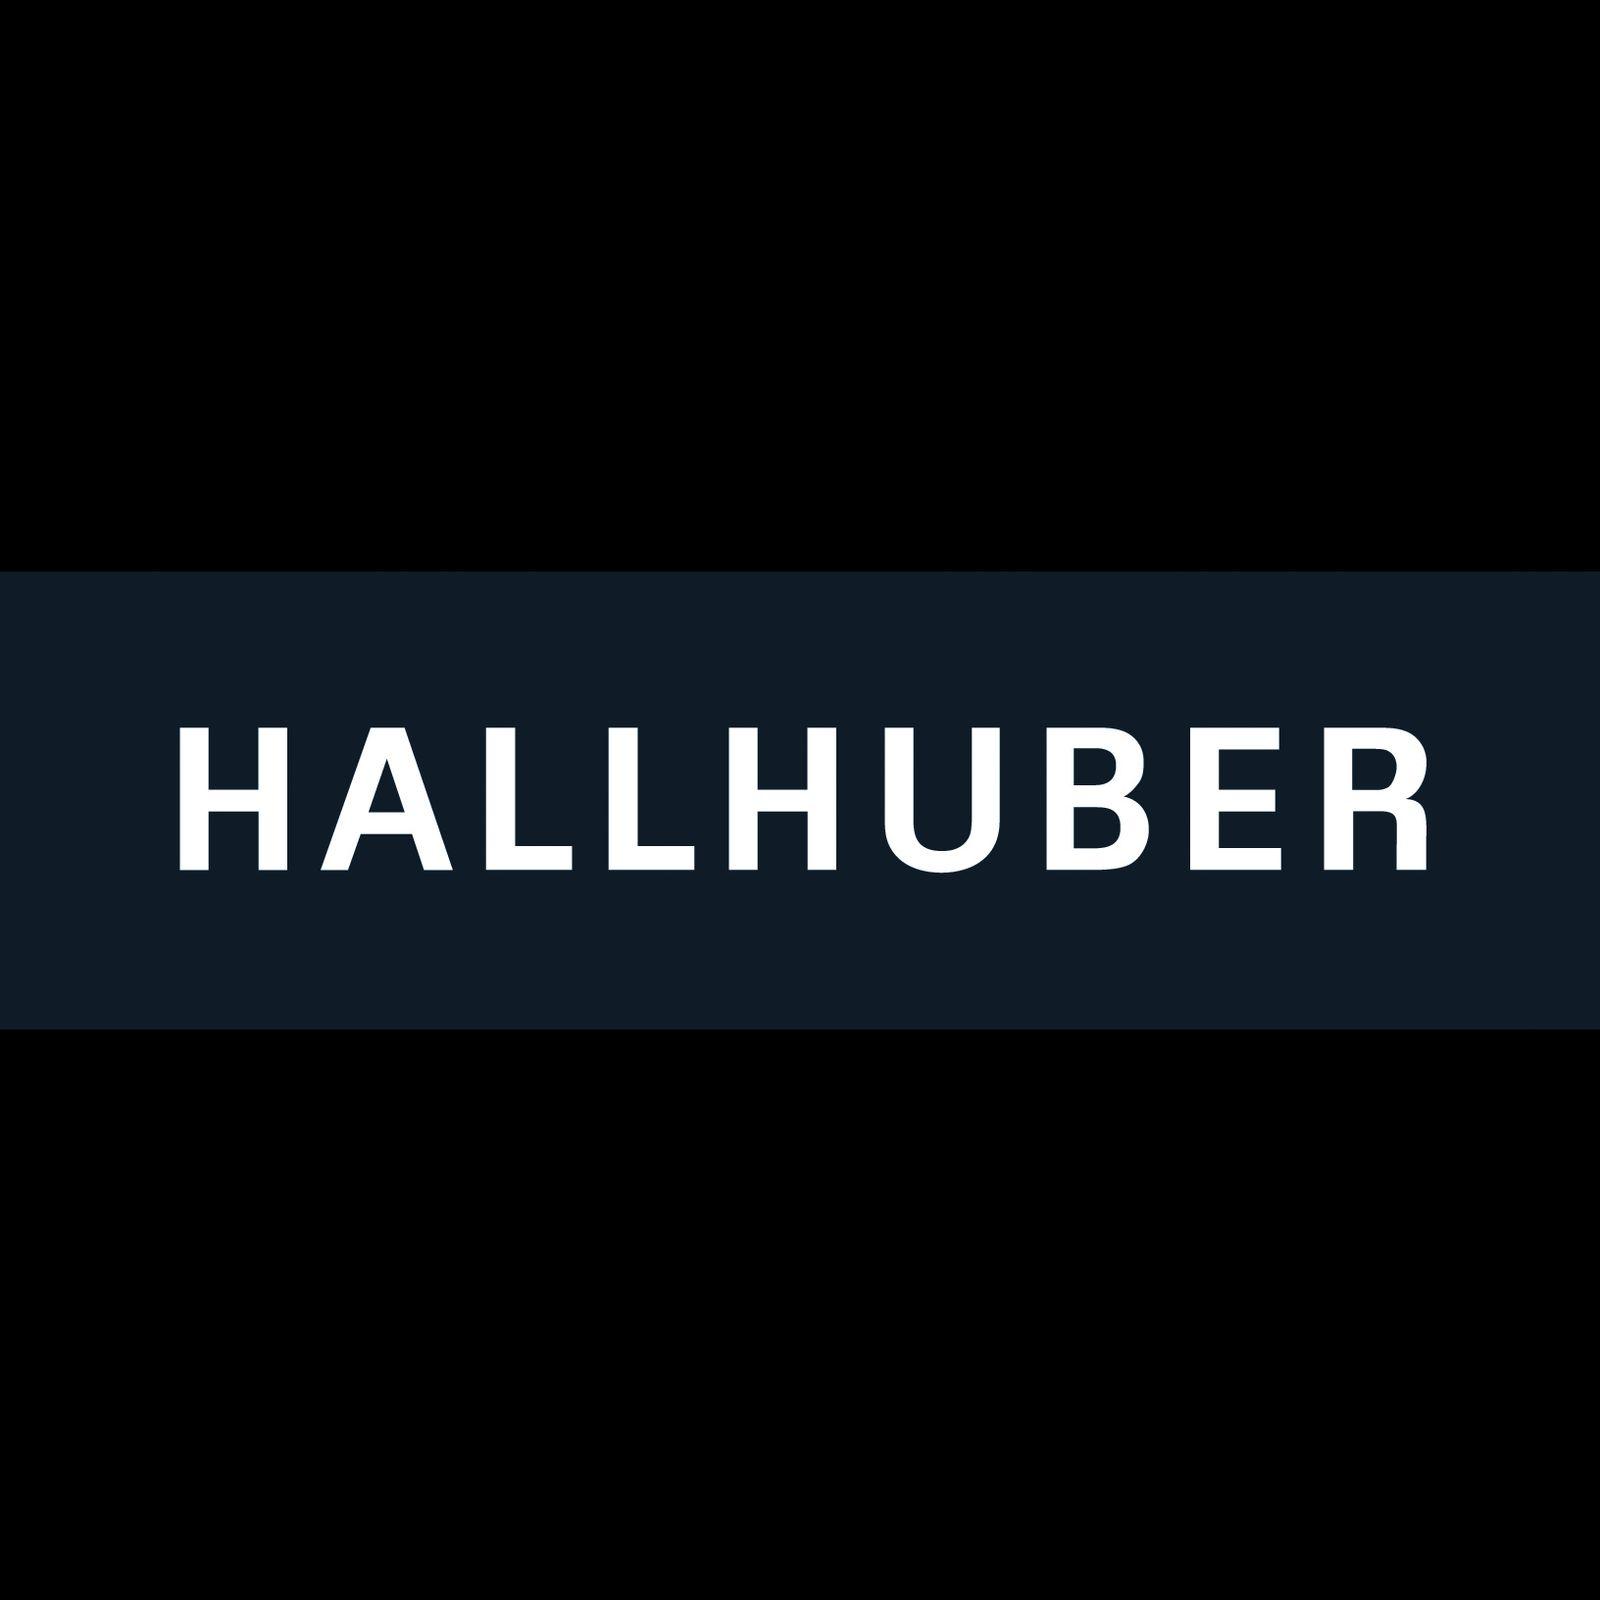 HALLHUBER (Image 1)